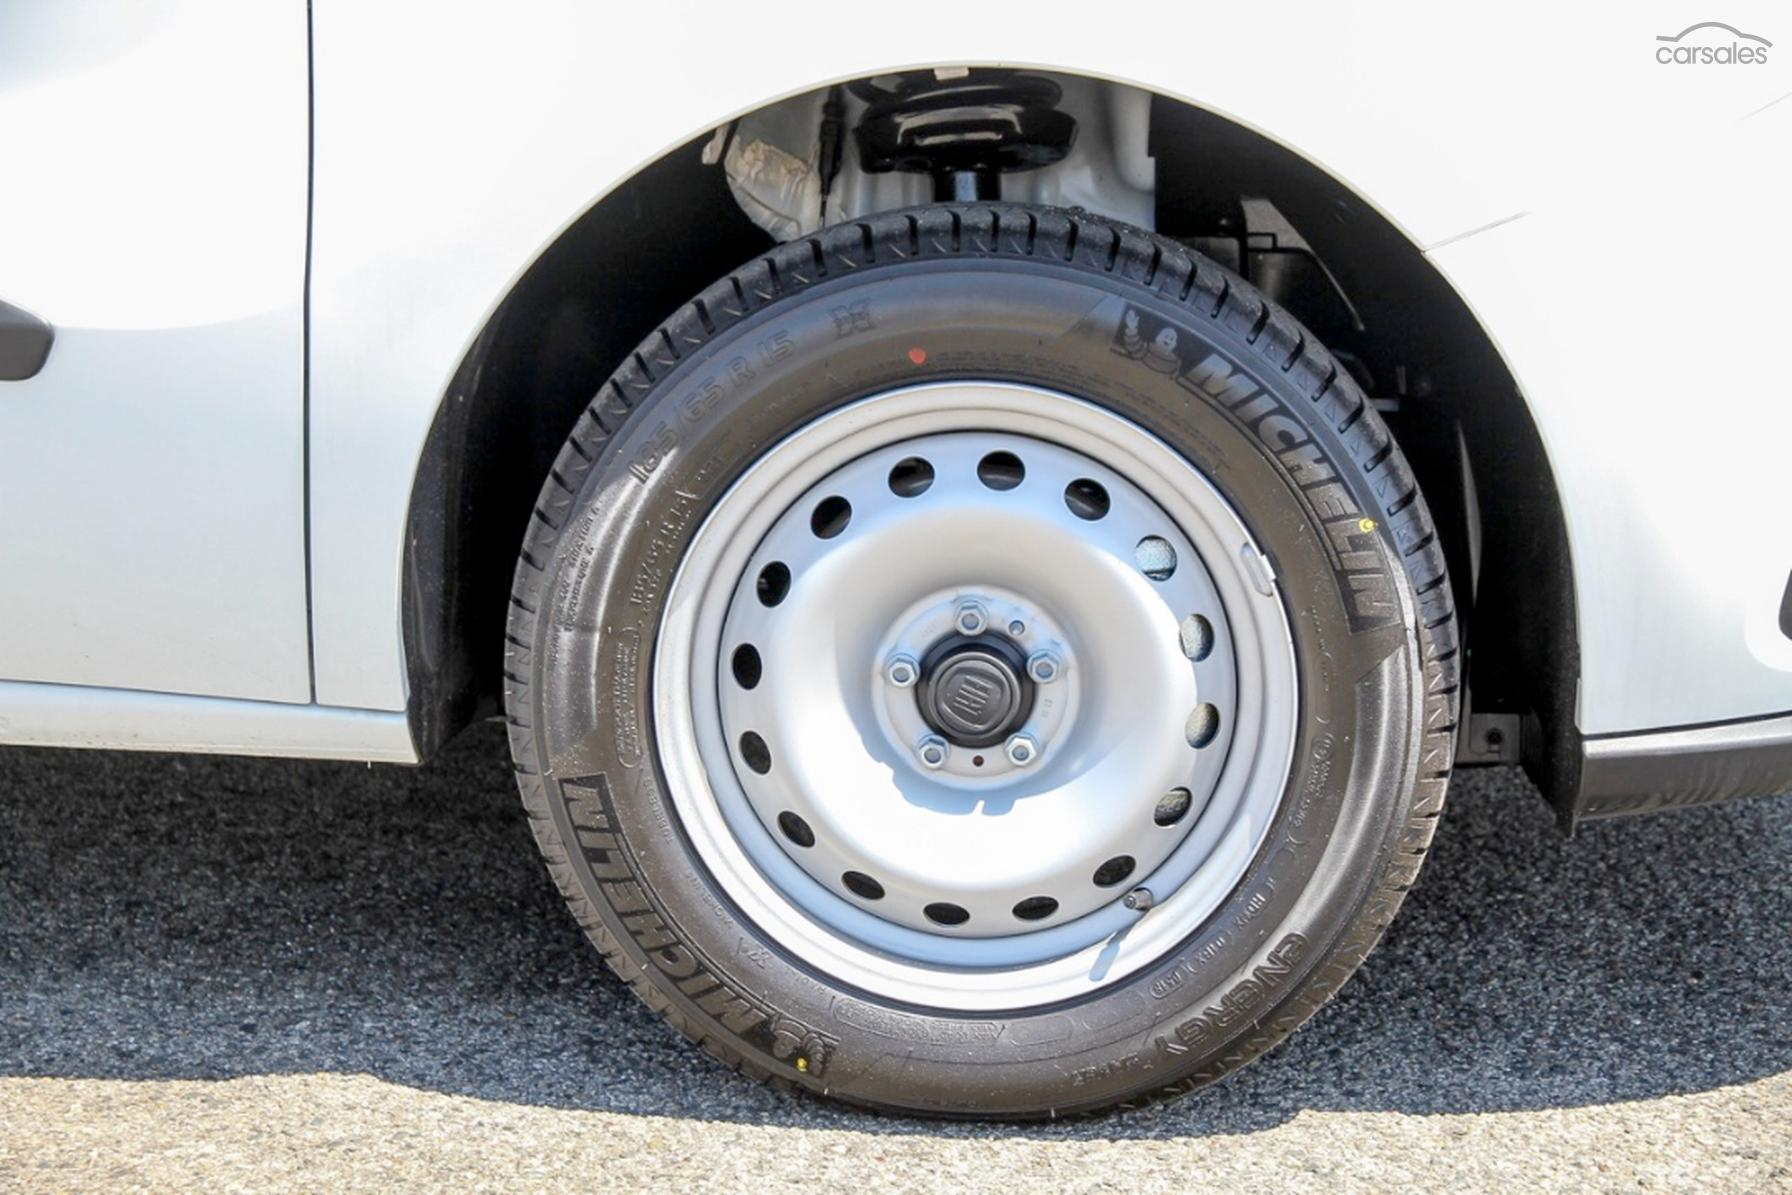 36176efa40 2018 Fiat Doblo SWB Auto-OAG-AD-16500430 - carsales.com.au